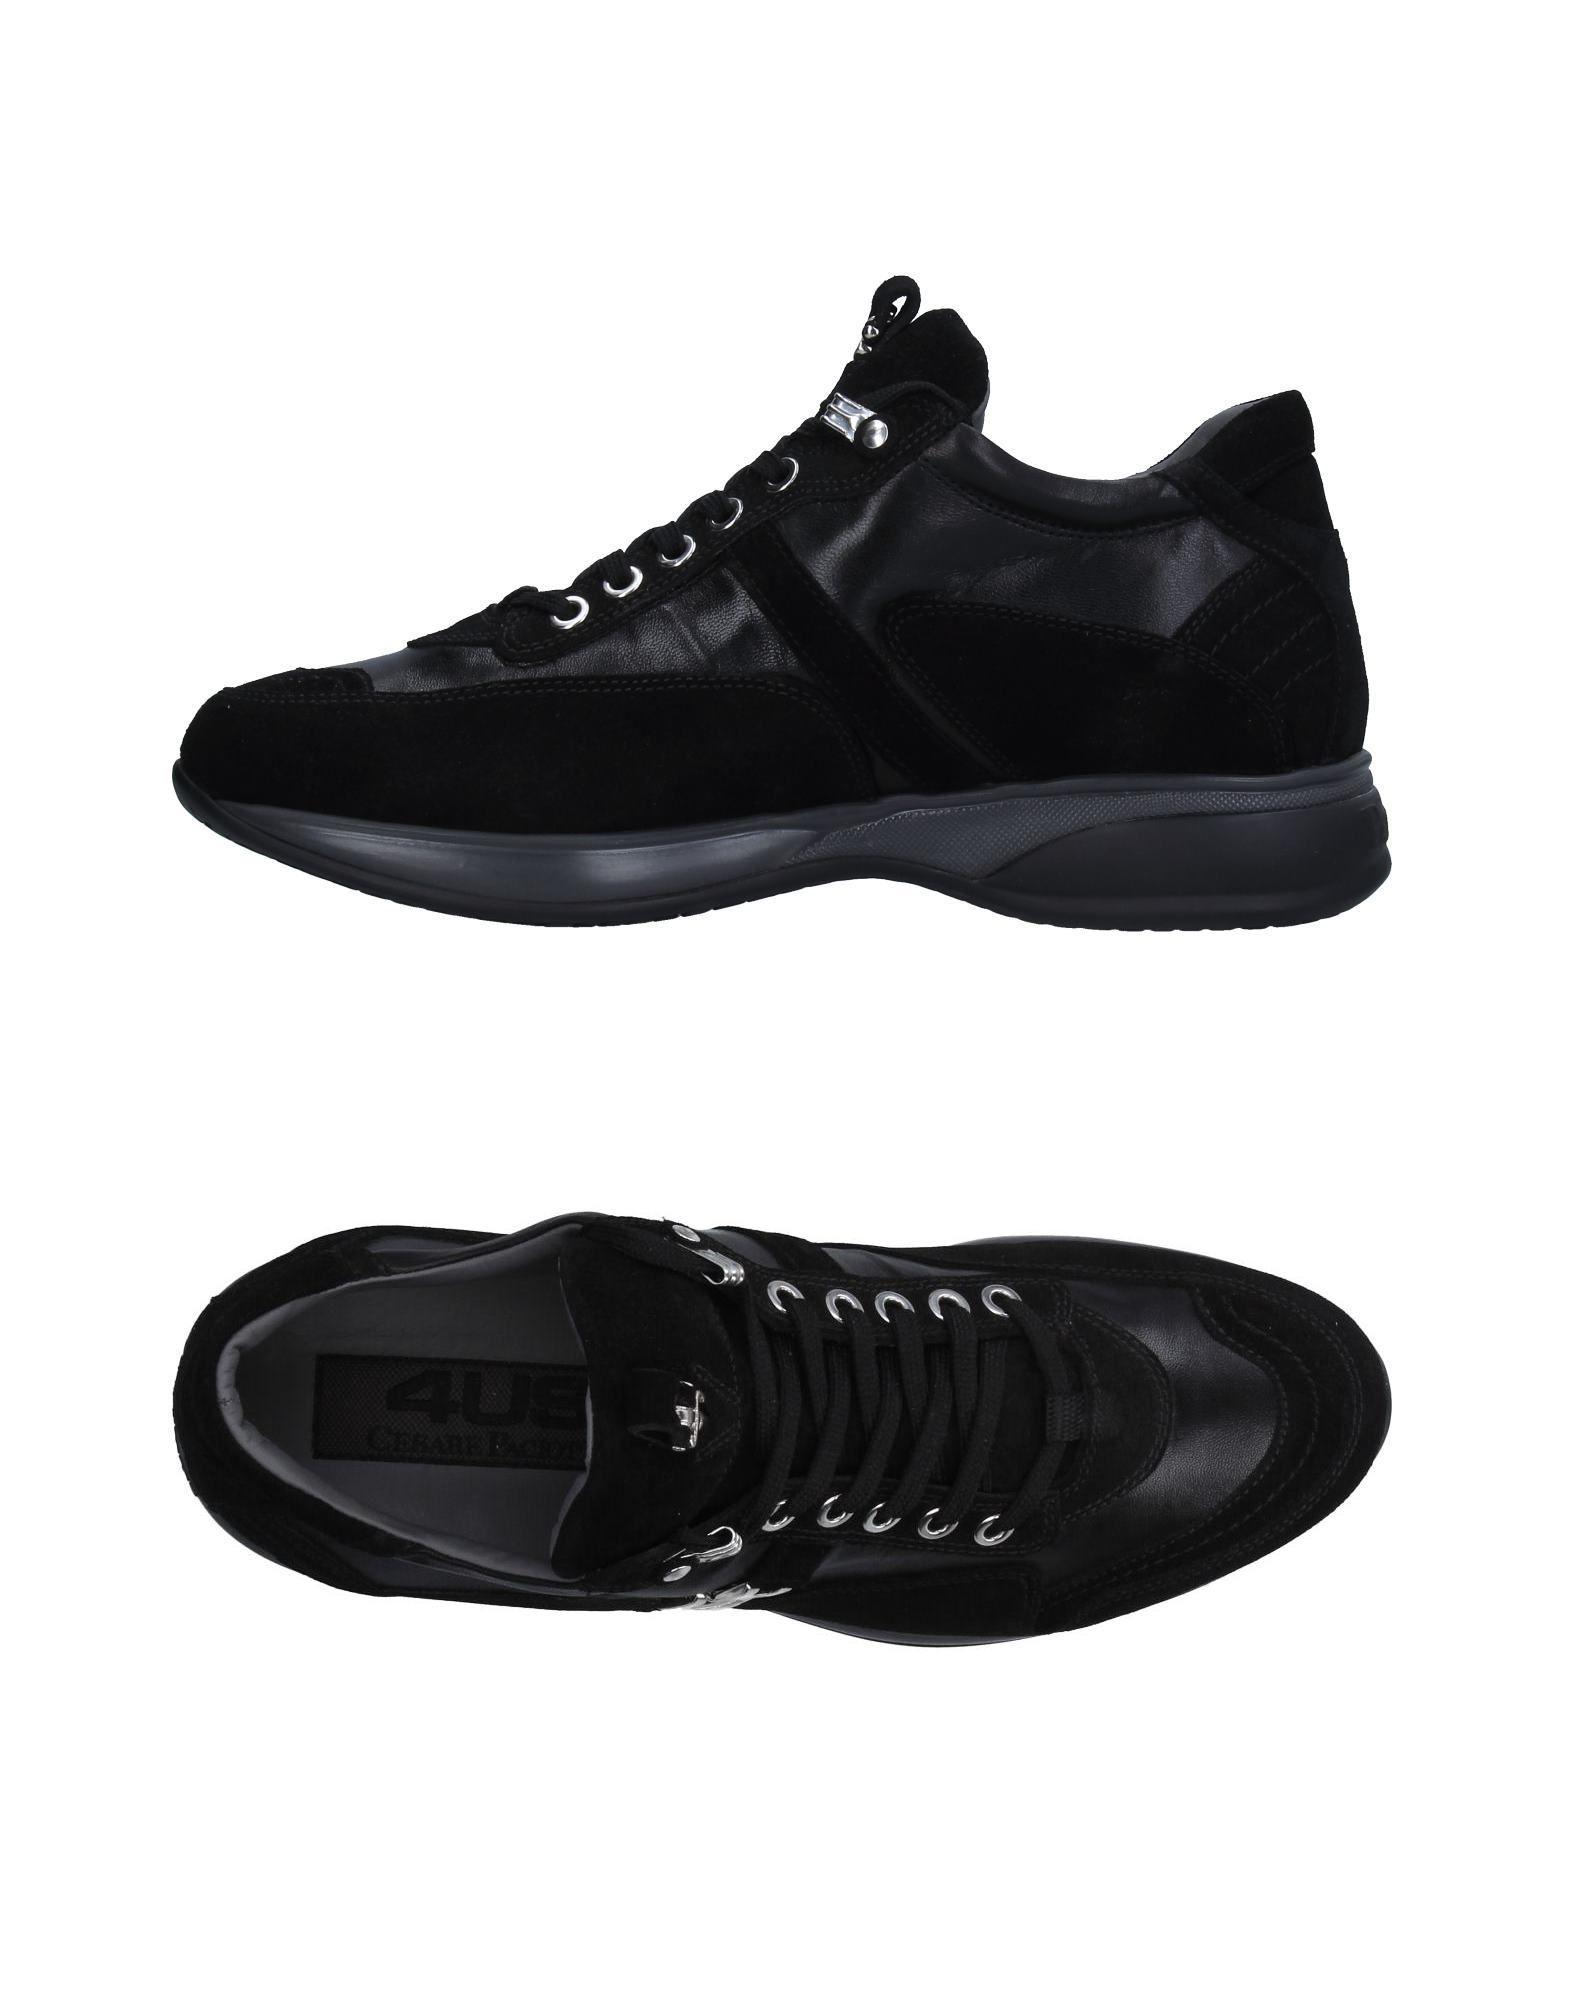 Cesare Paciotti 4Us Sneakers Herren  11280015FD Gute Qualität beliebte Schuhe